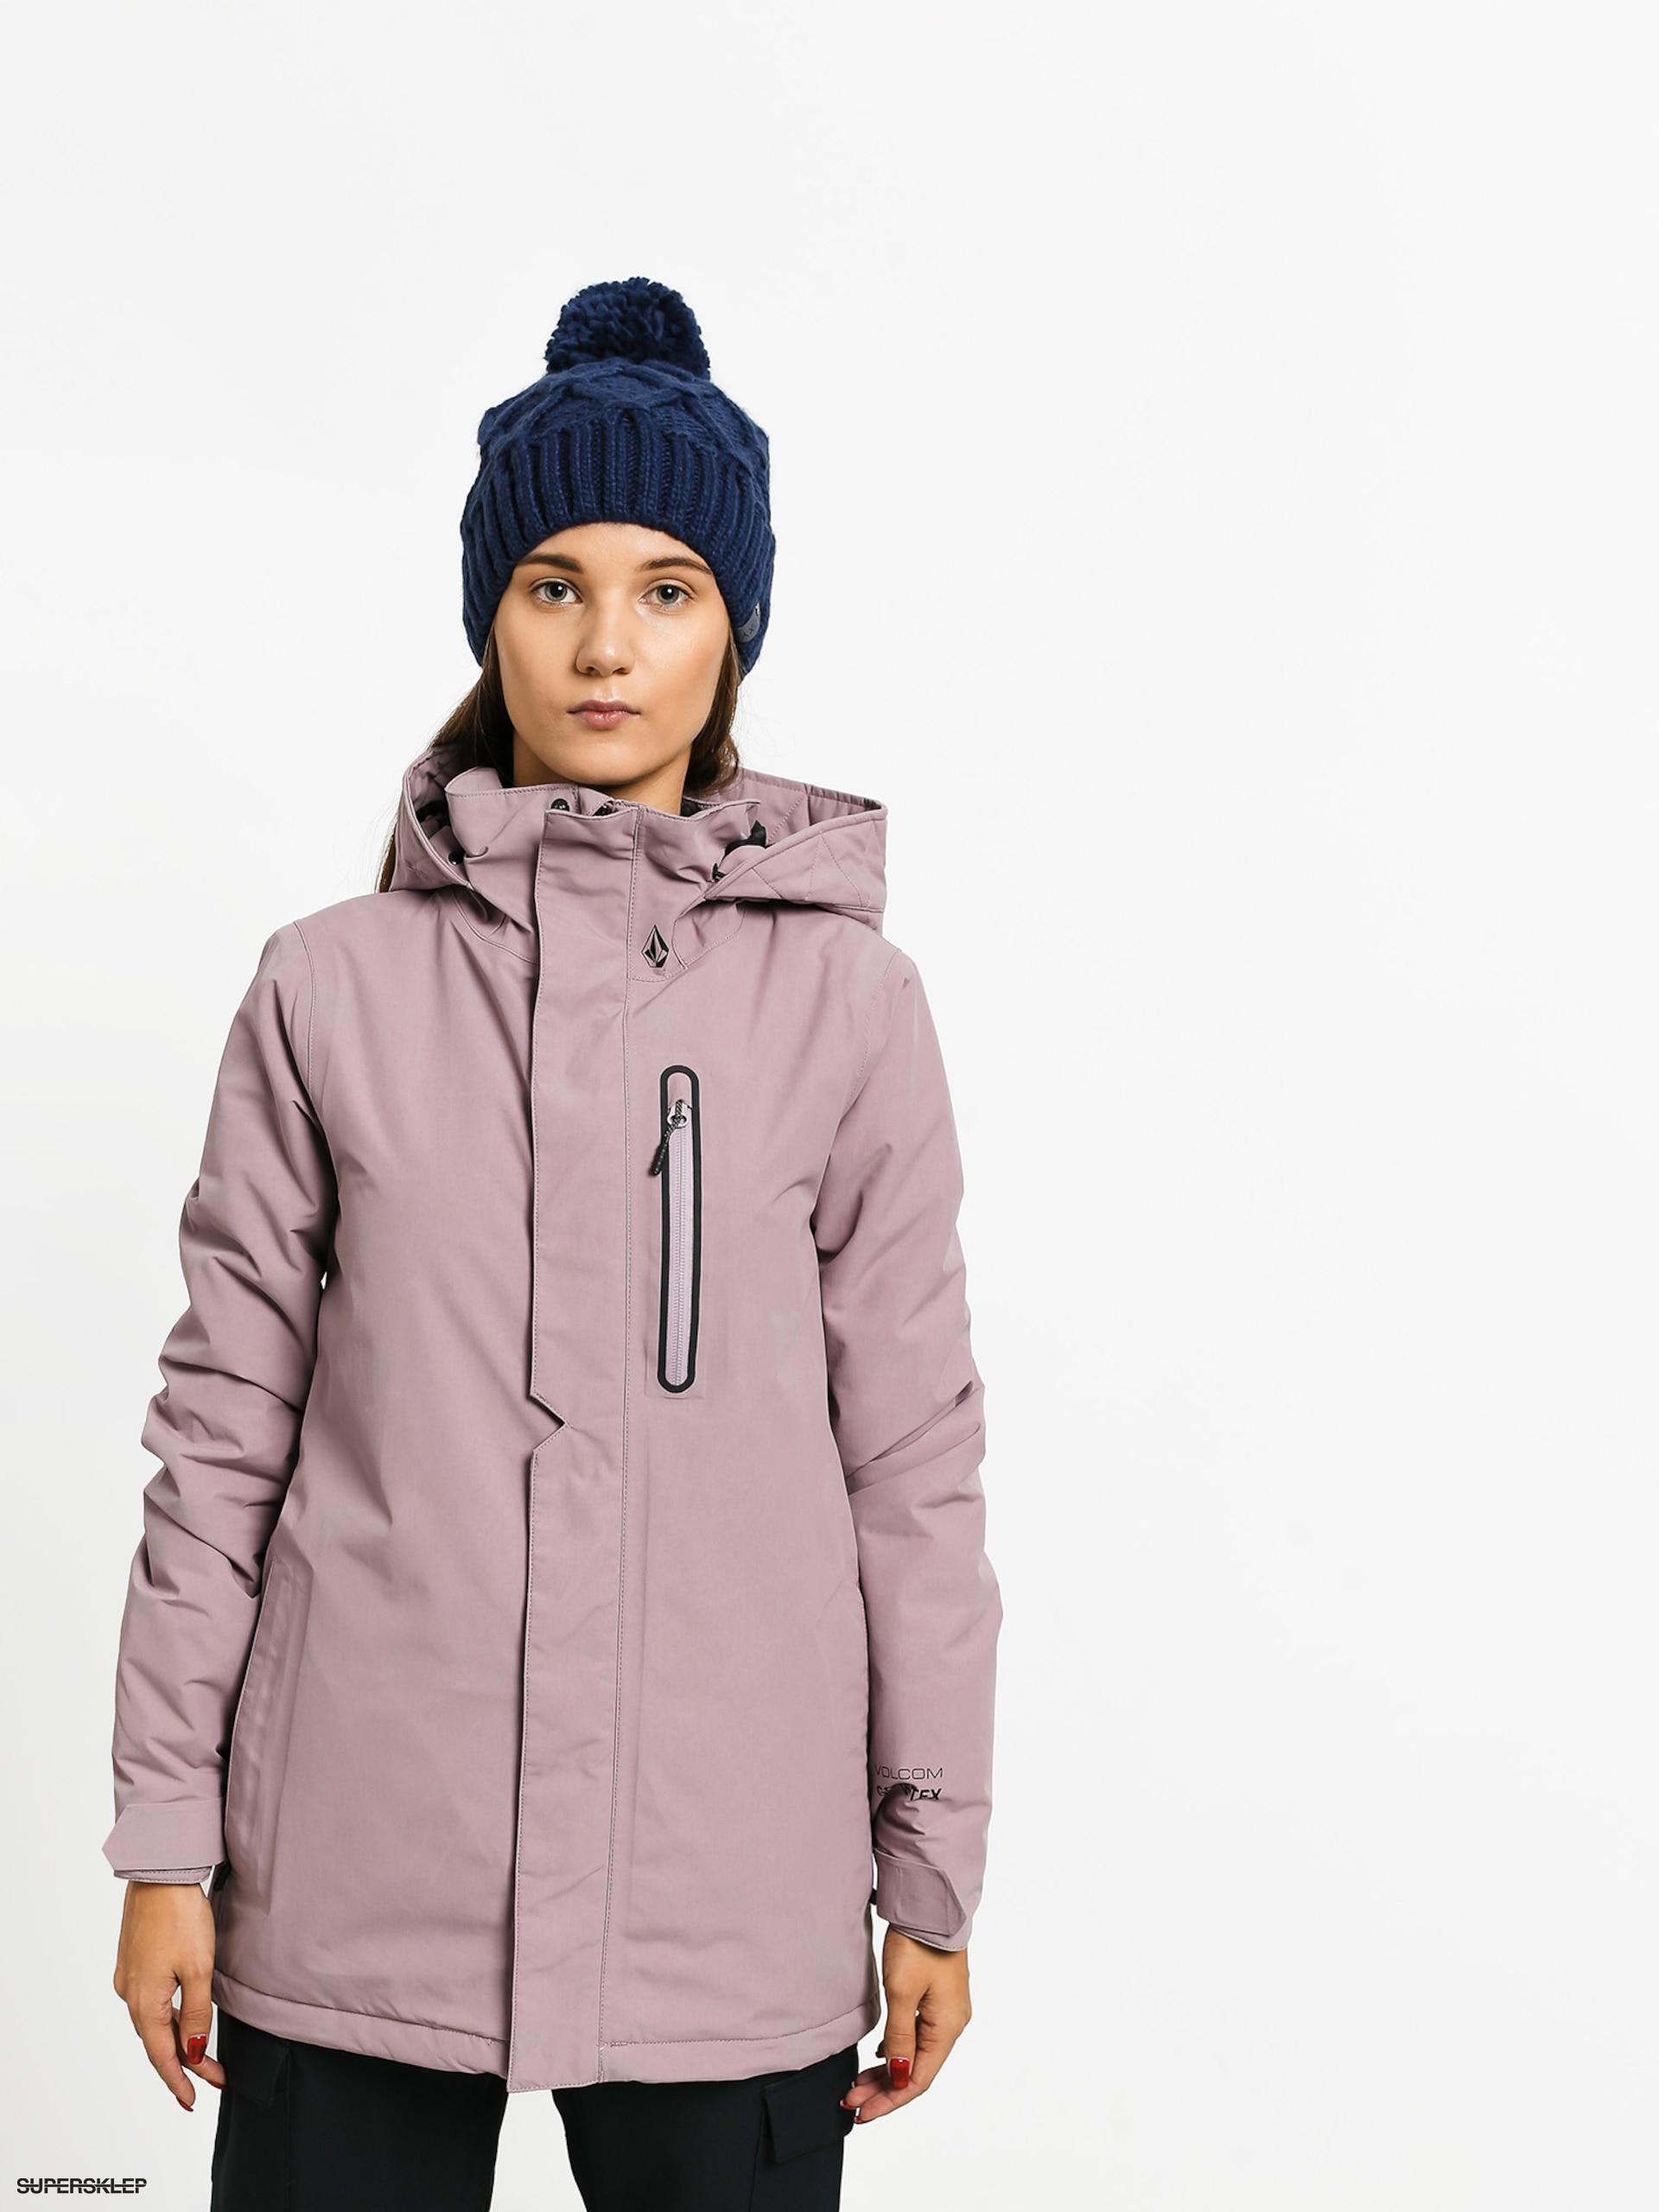 kurtka volcom narciarska damska